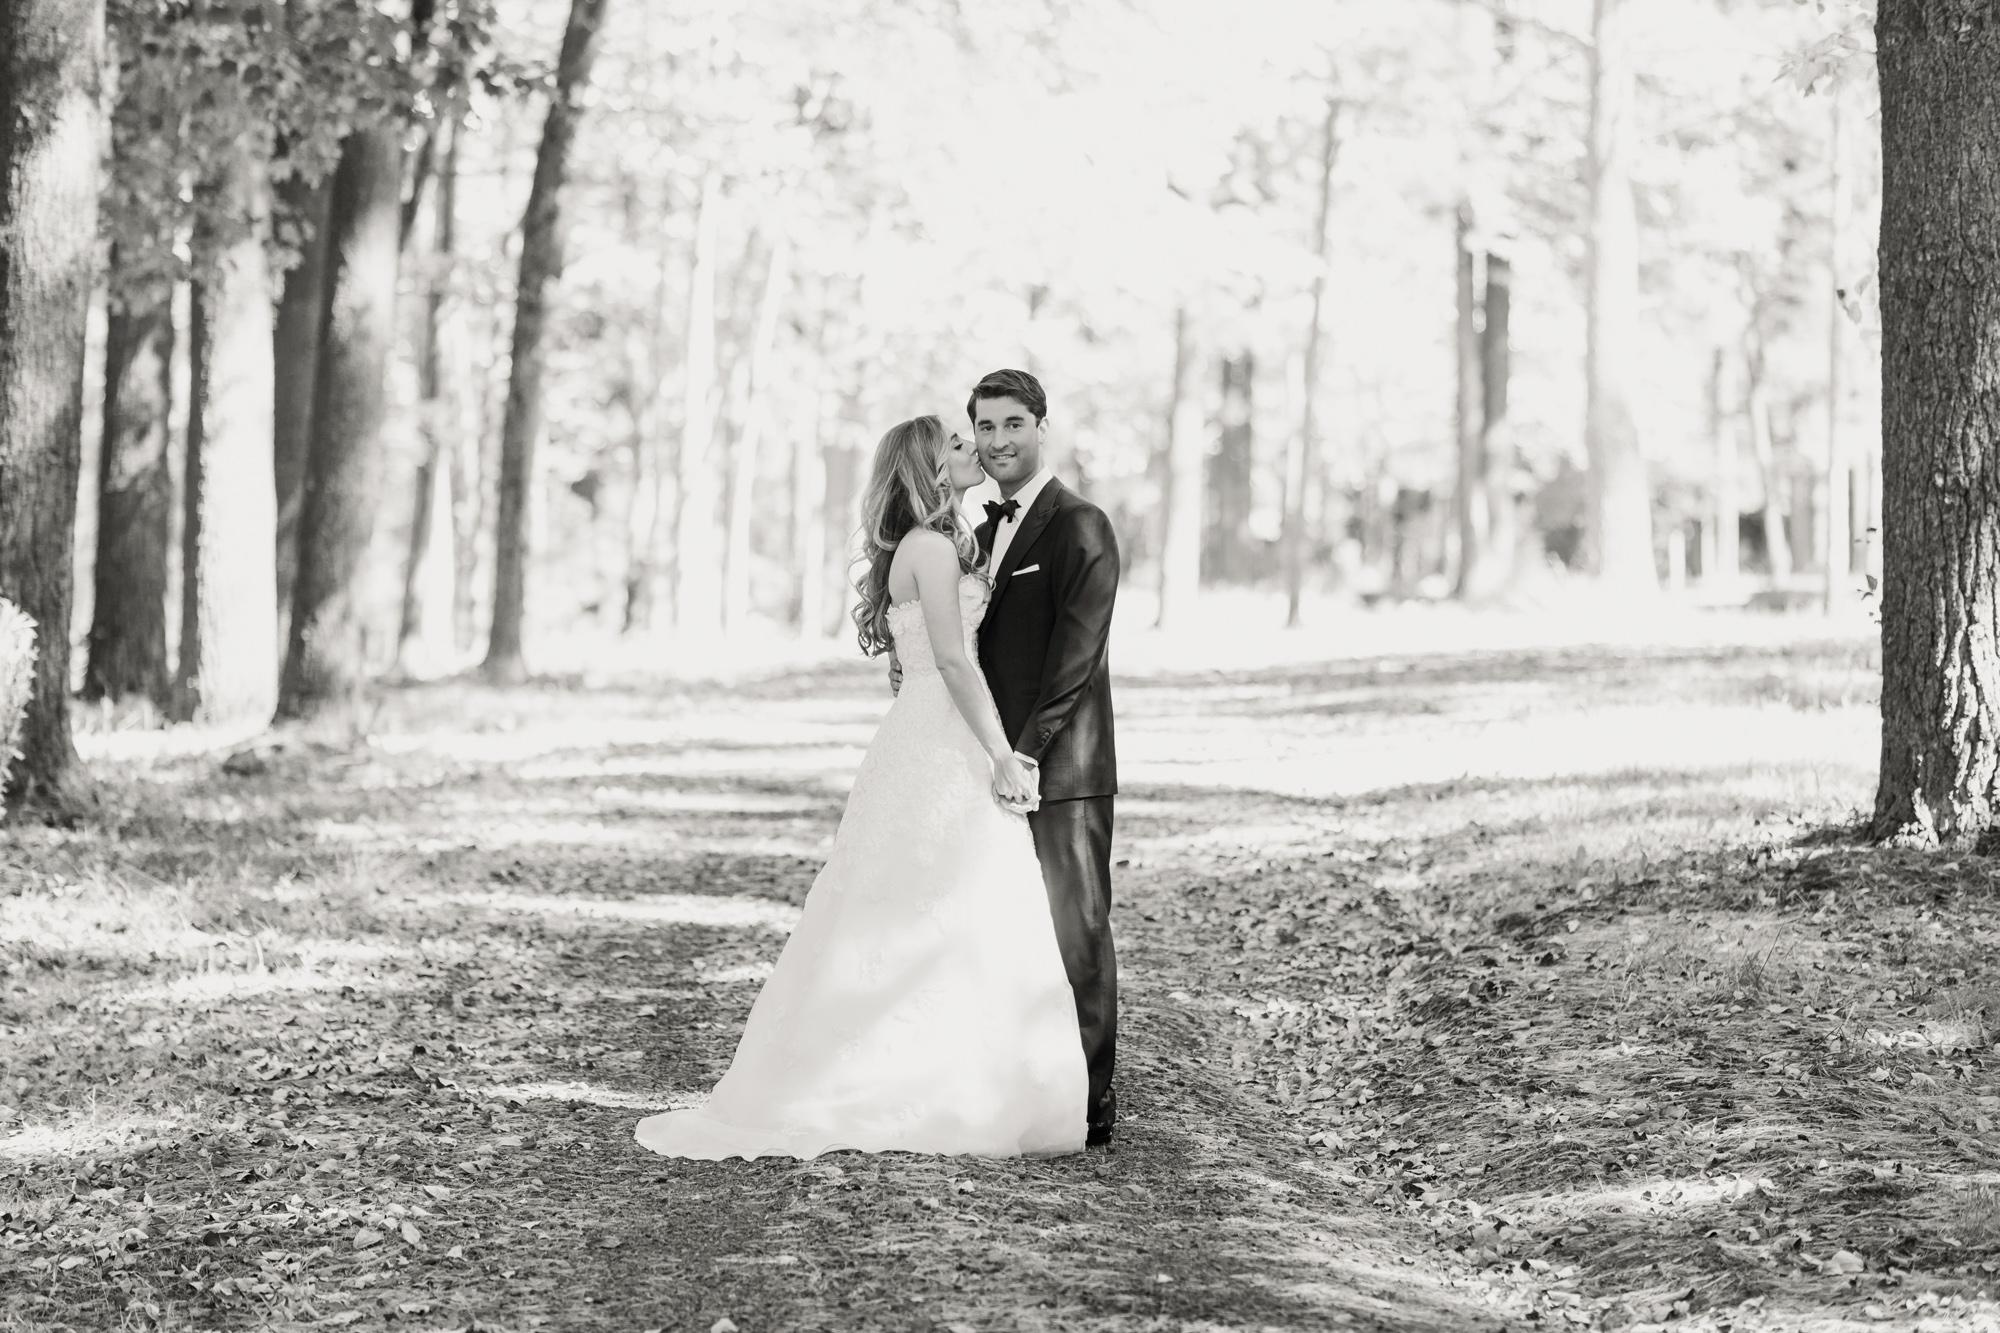 25b_Christina_Daniel_Hamilton_Farm_Golf_Club_Wedding_NJ_Tanya_Salazar_Photography_255.jpg